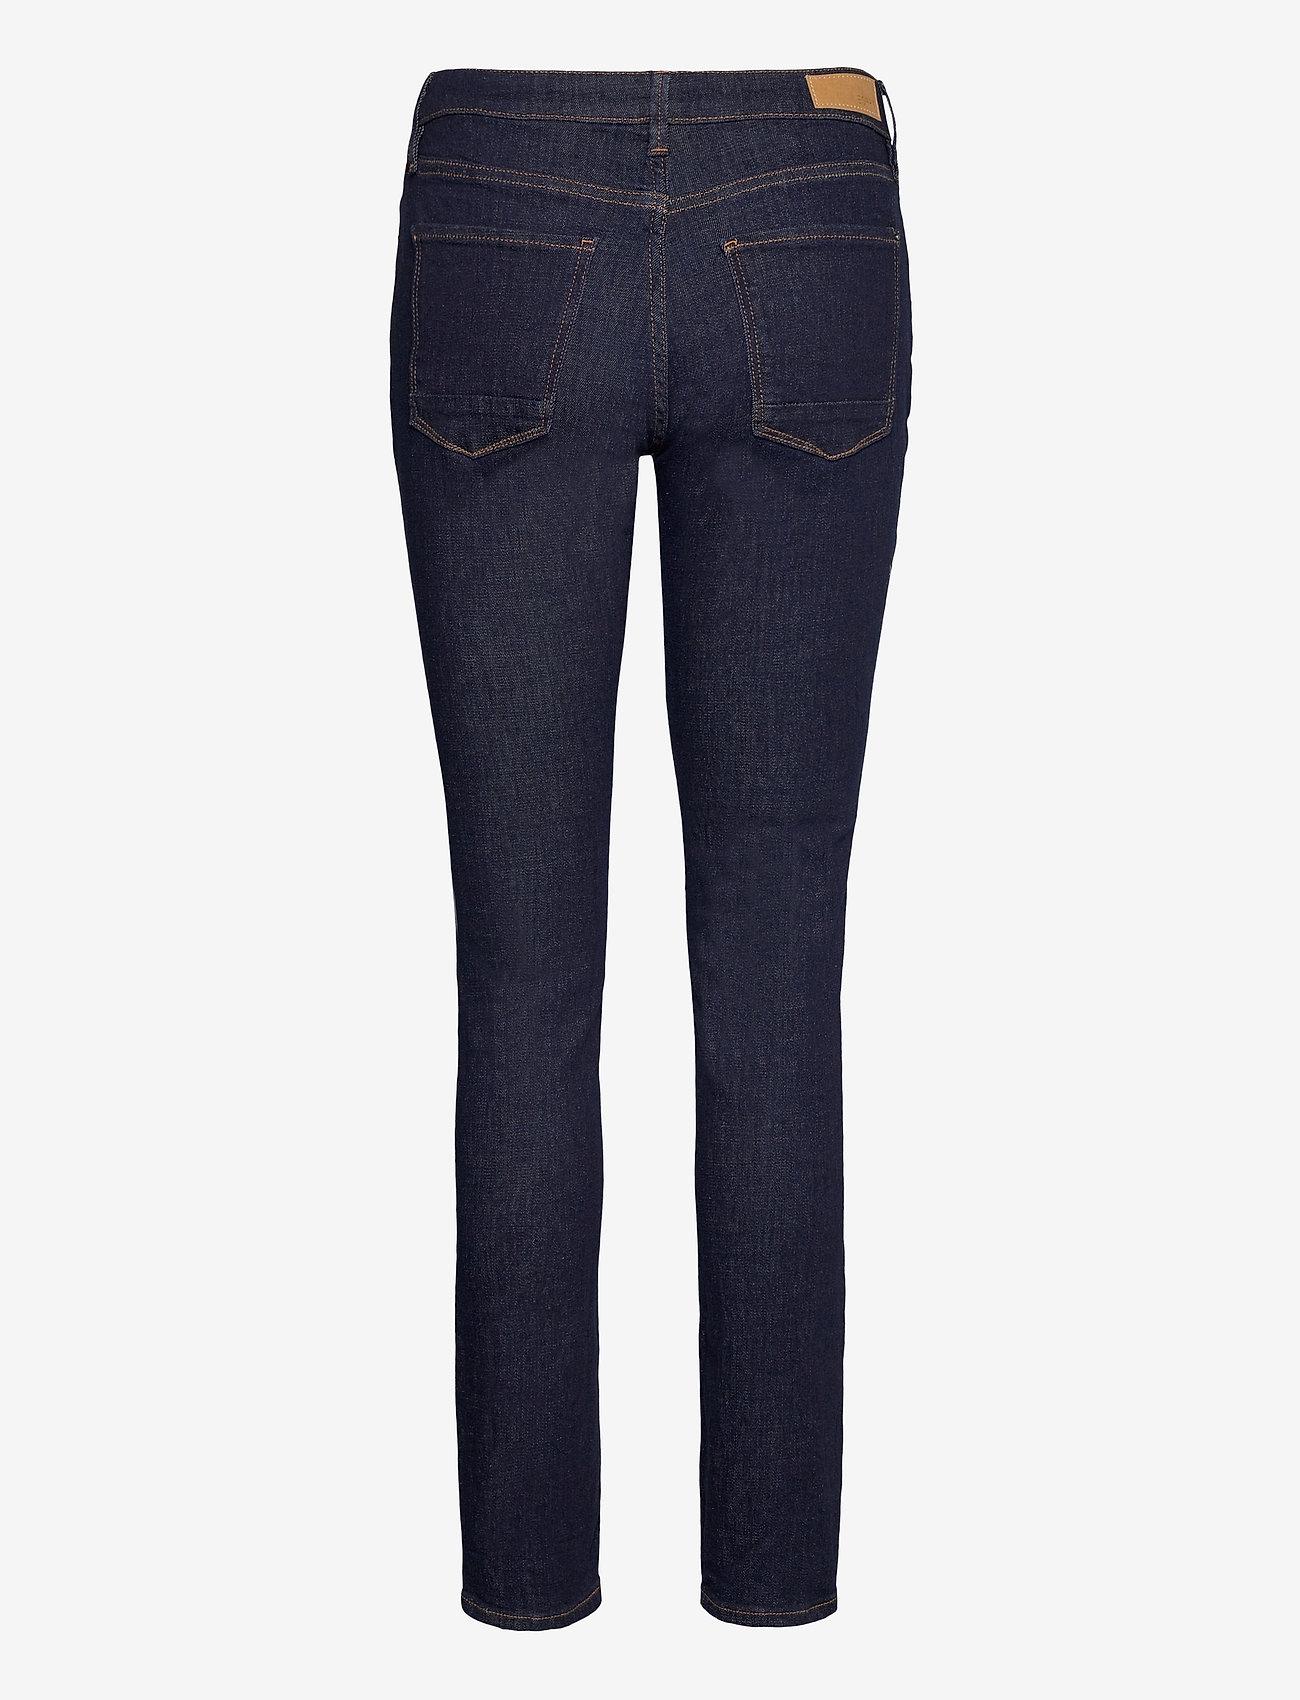 Esprit Casual - Pants denim - slim jeans - blue rinse - 1